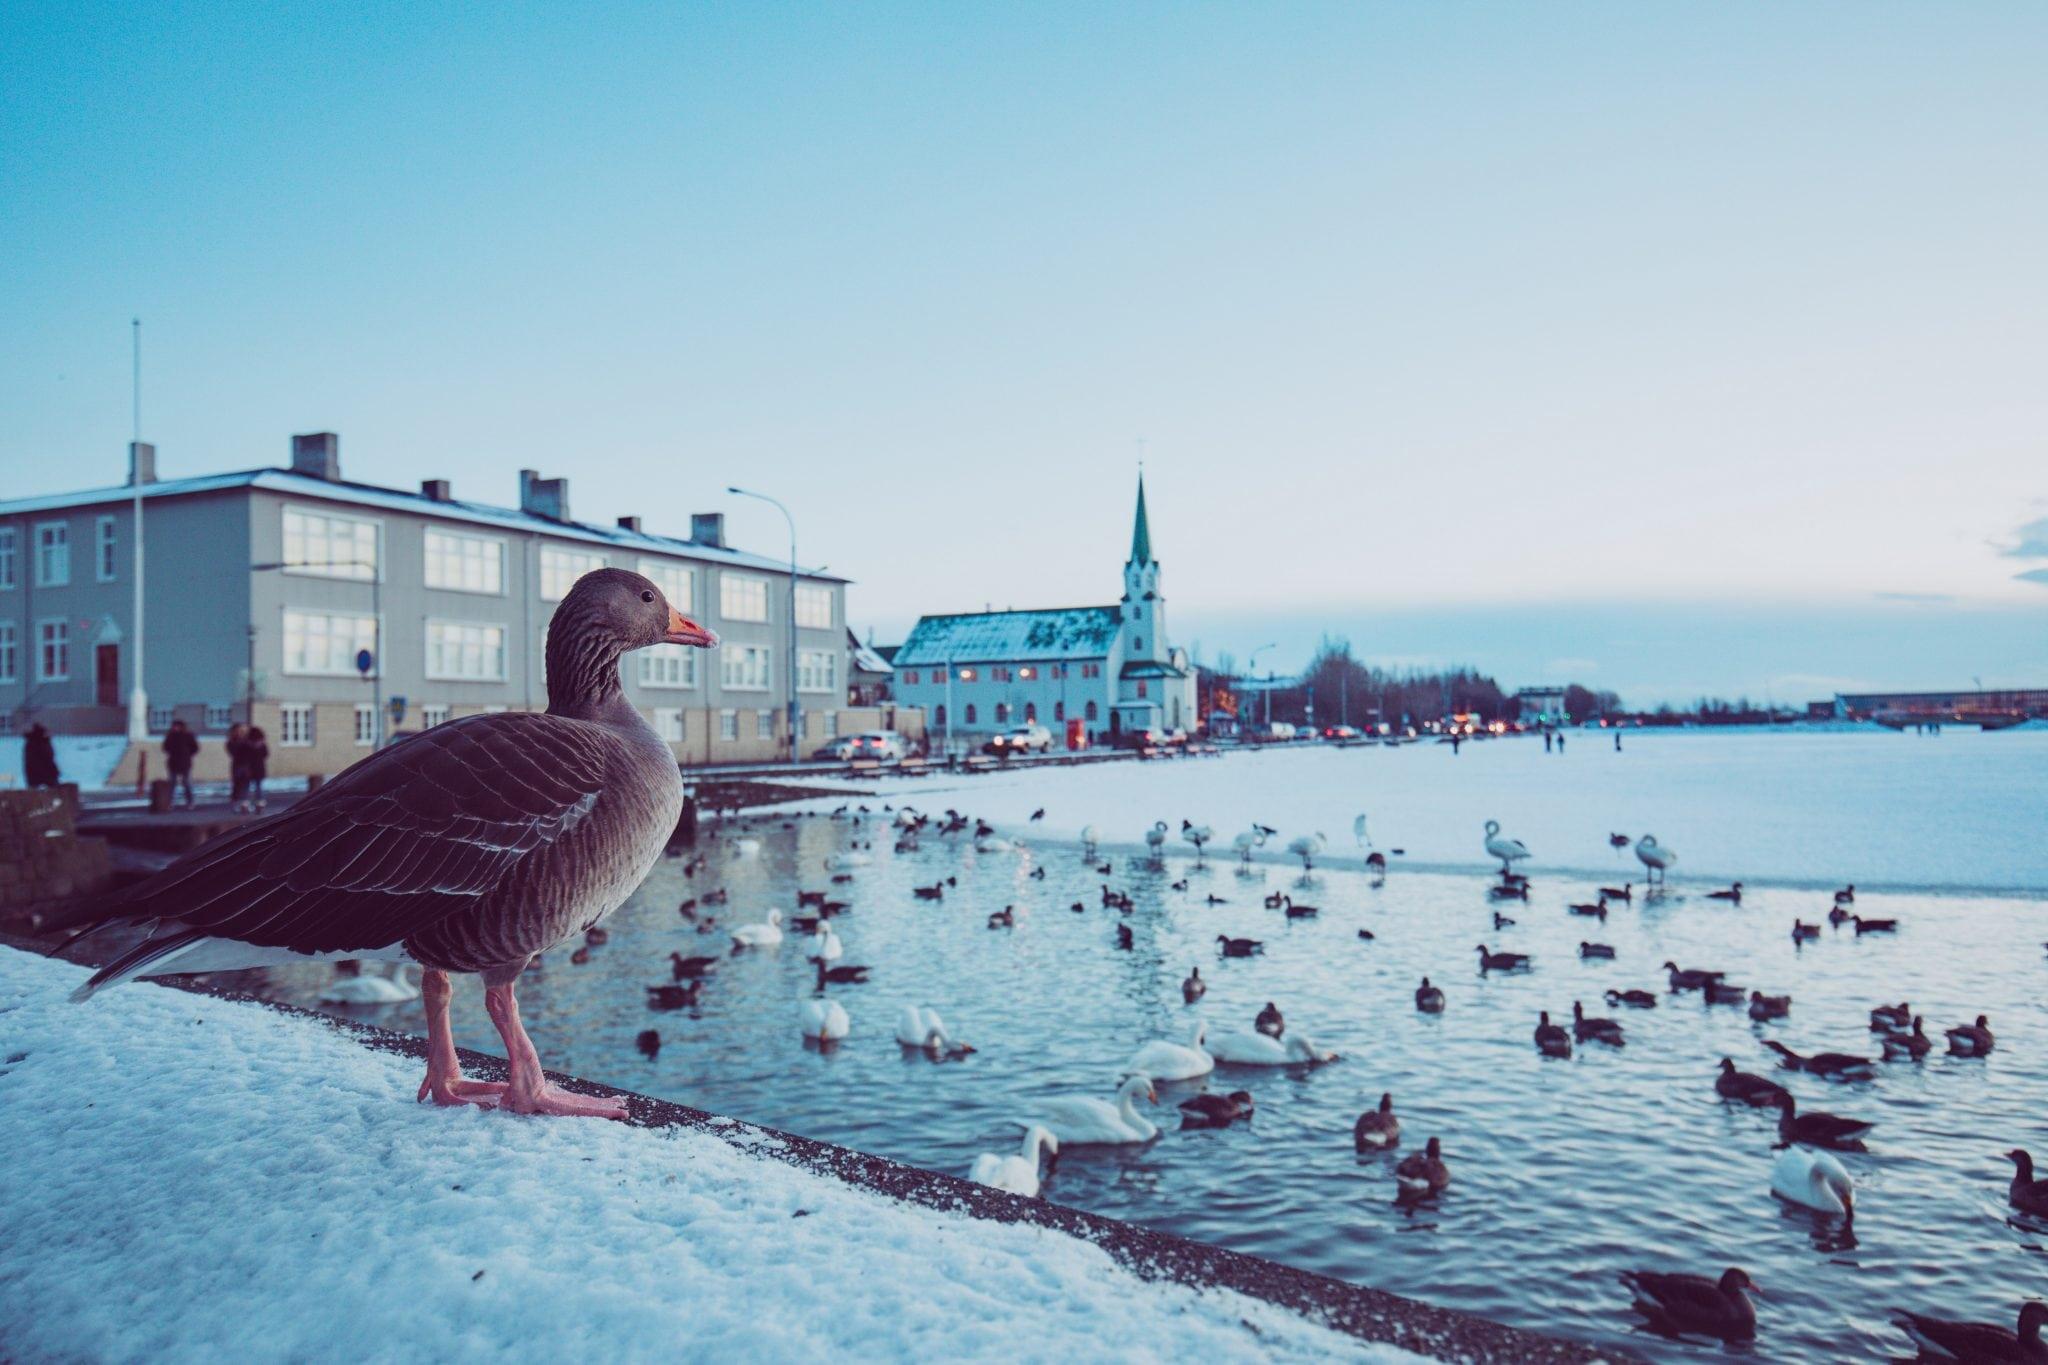 Ducks on Reykjavik pond